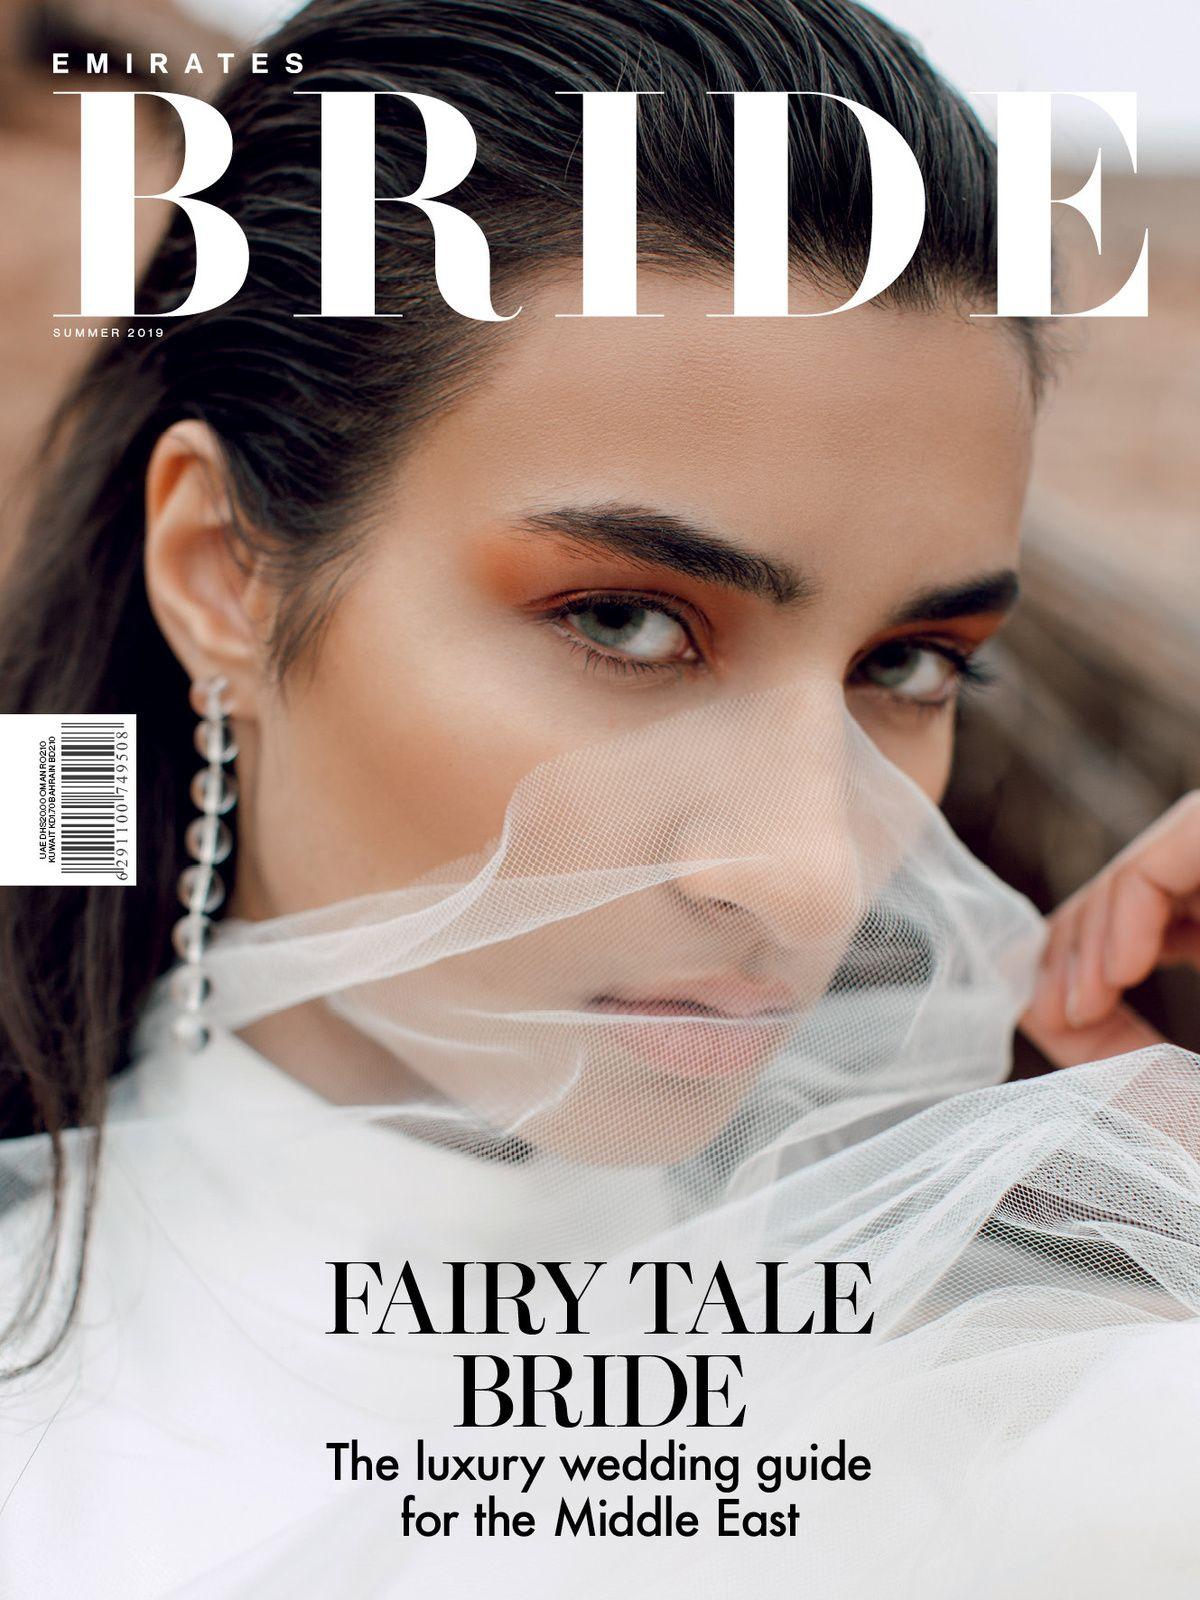 The-saums-emirates-woman-bride-cover-marrakech.jpg